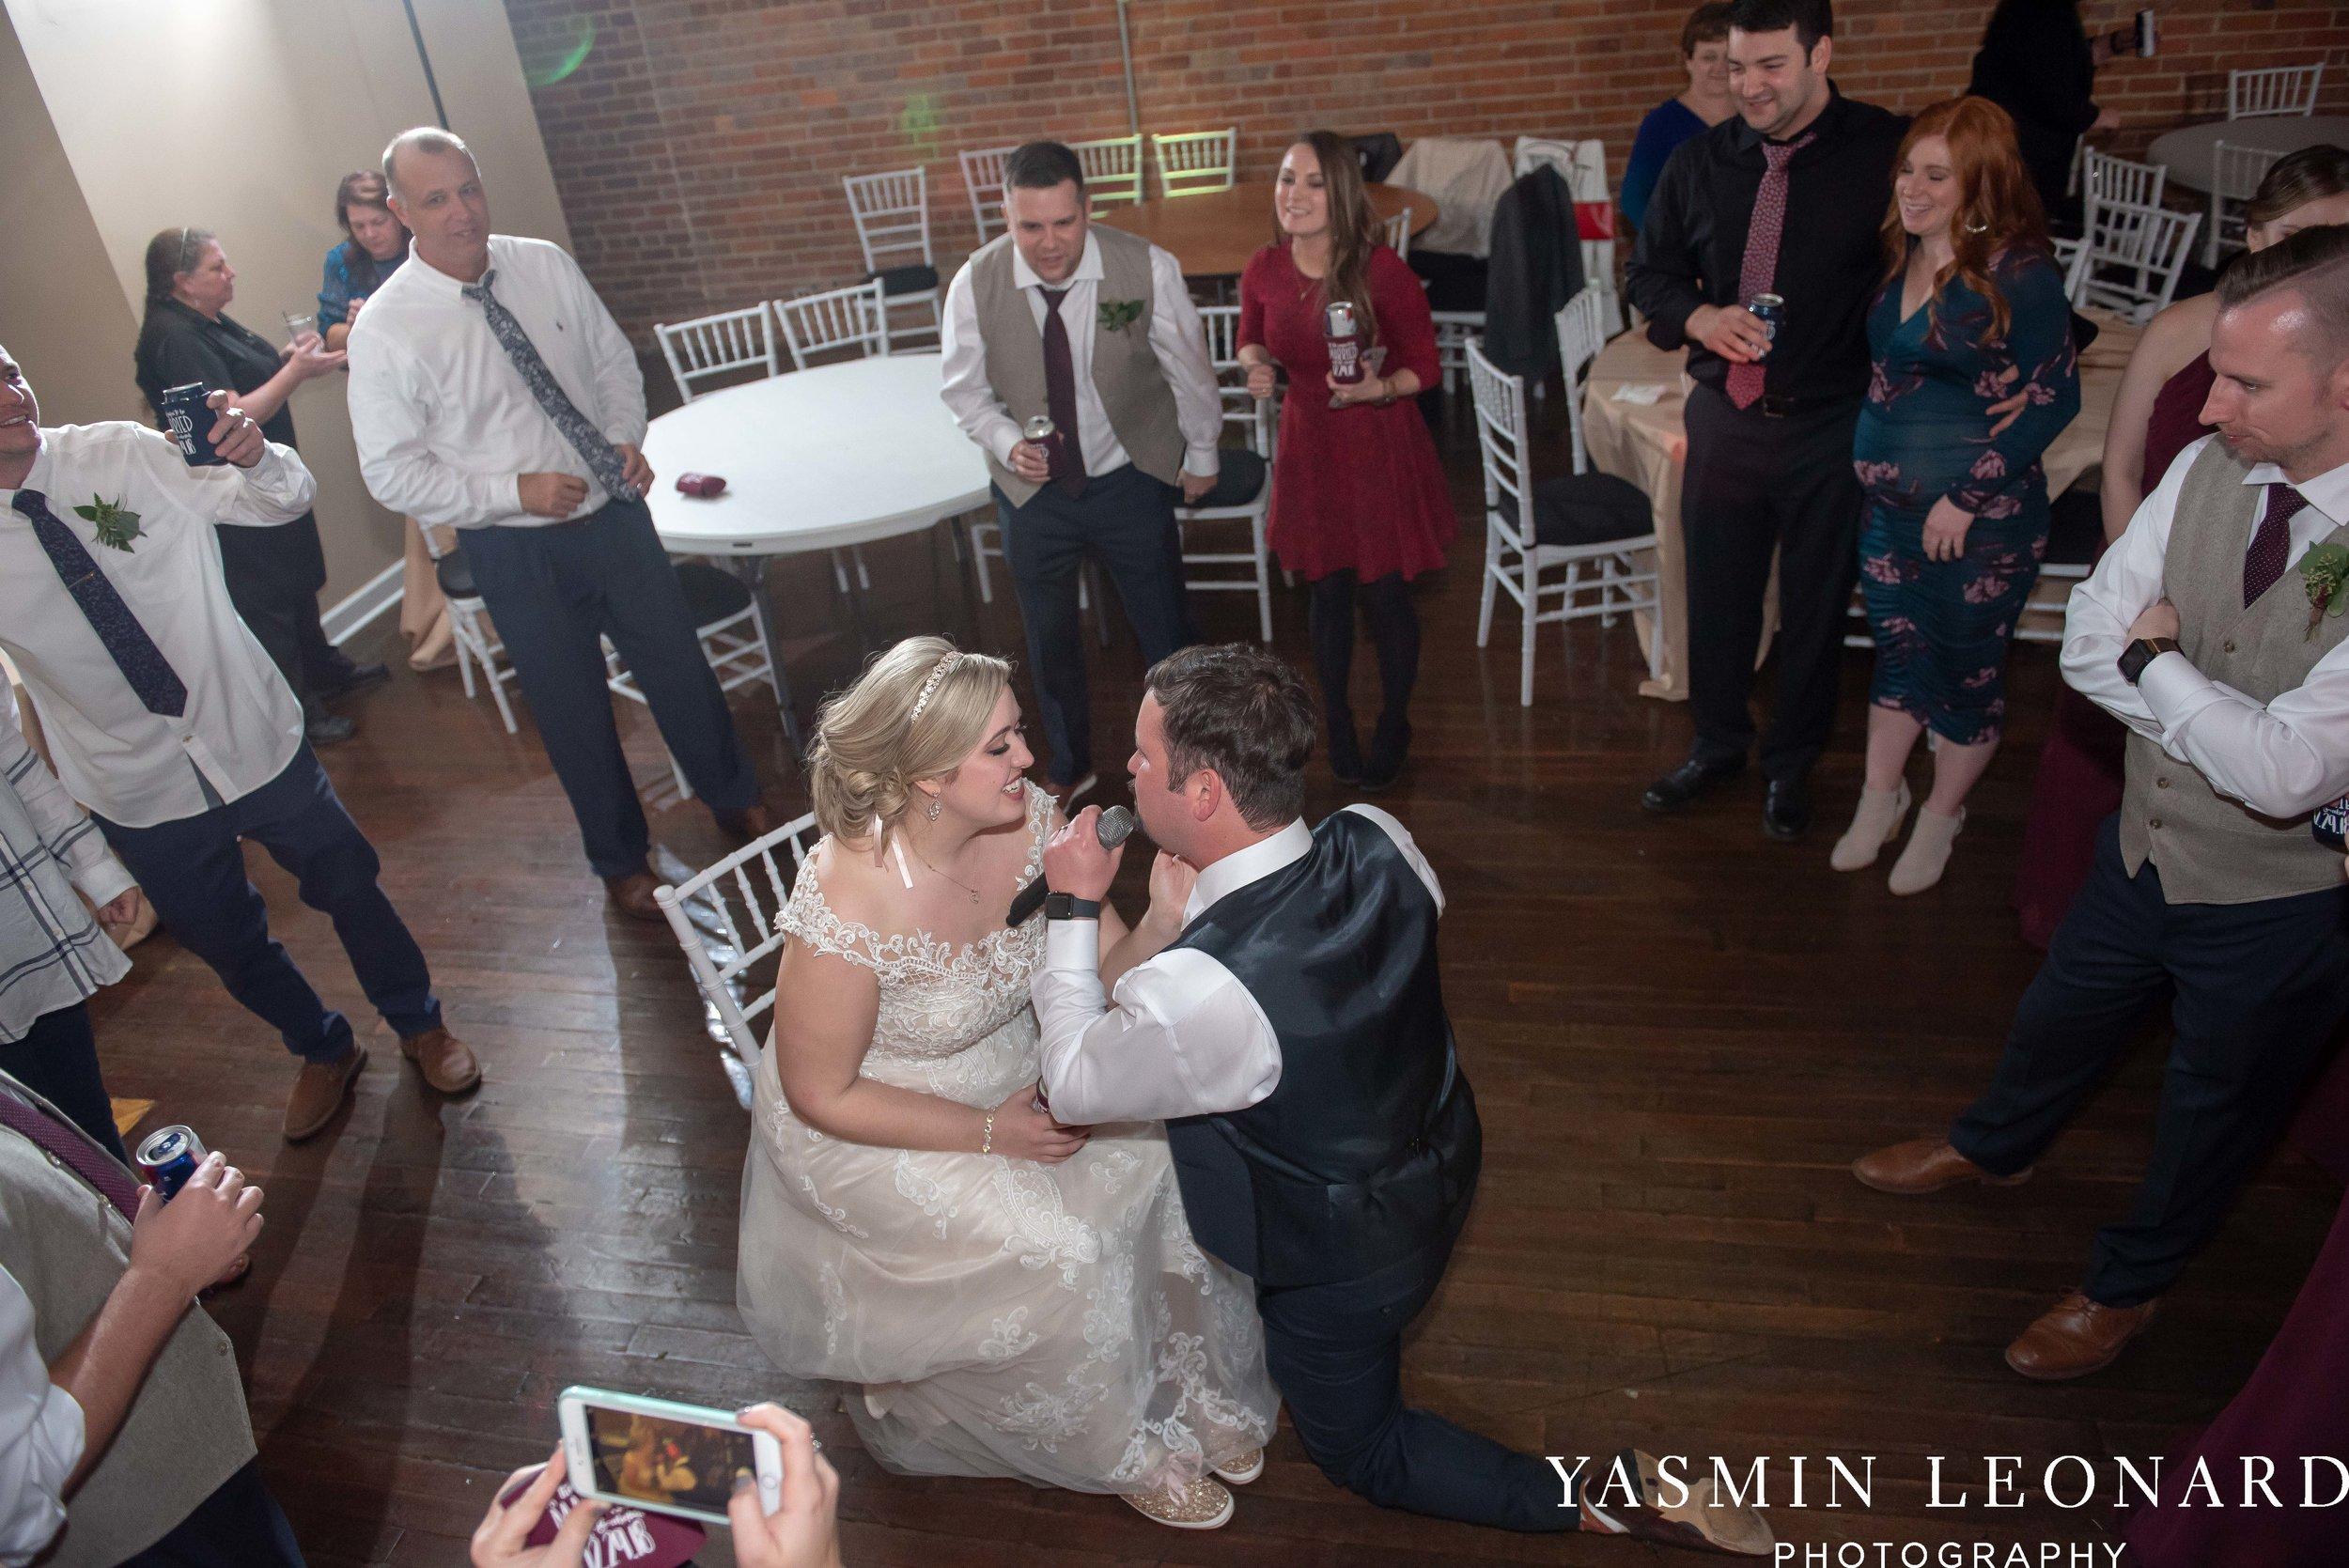 Rebekah and Matt - 105 Worth Event Centre - Yasmin Leonard Photography - Asheboro Wedding - NC Wedding - High Point Weddings - Triad Weddings - Winter Wedding-88.jpg